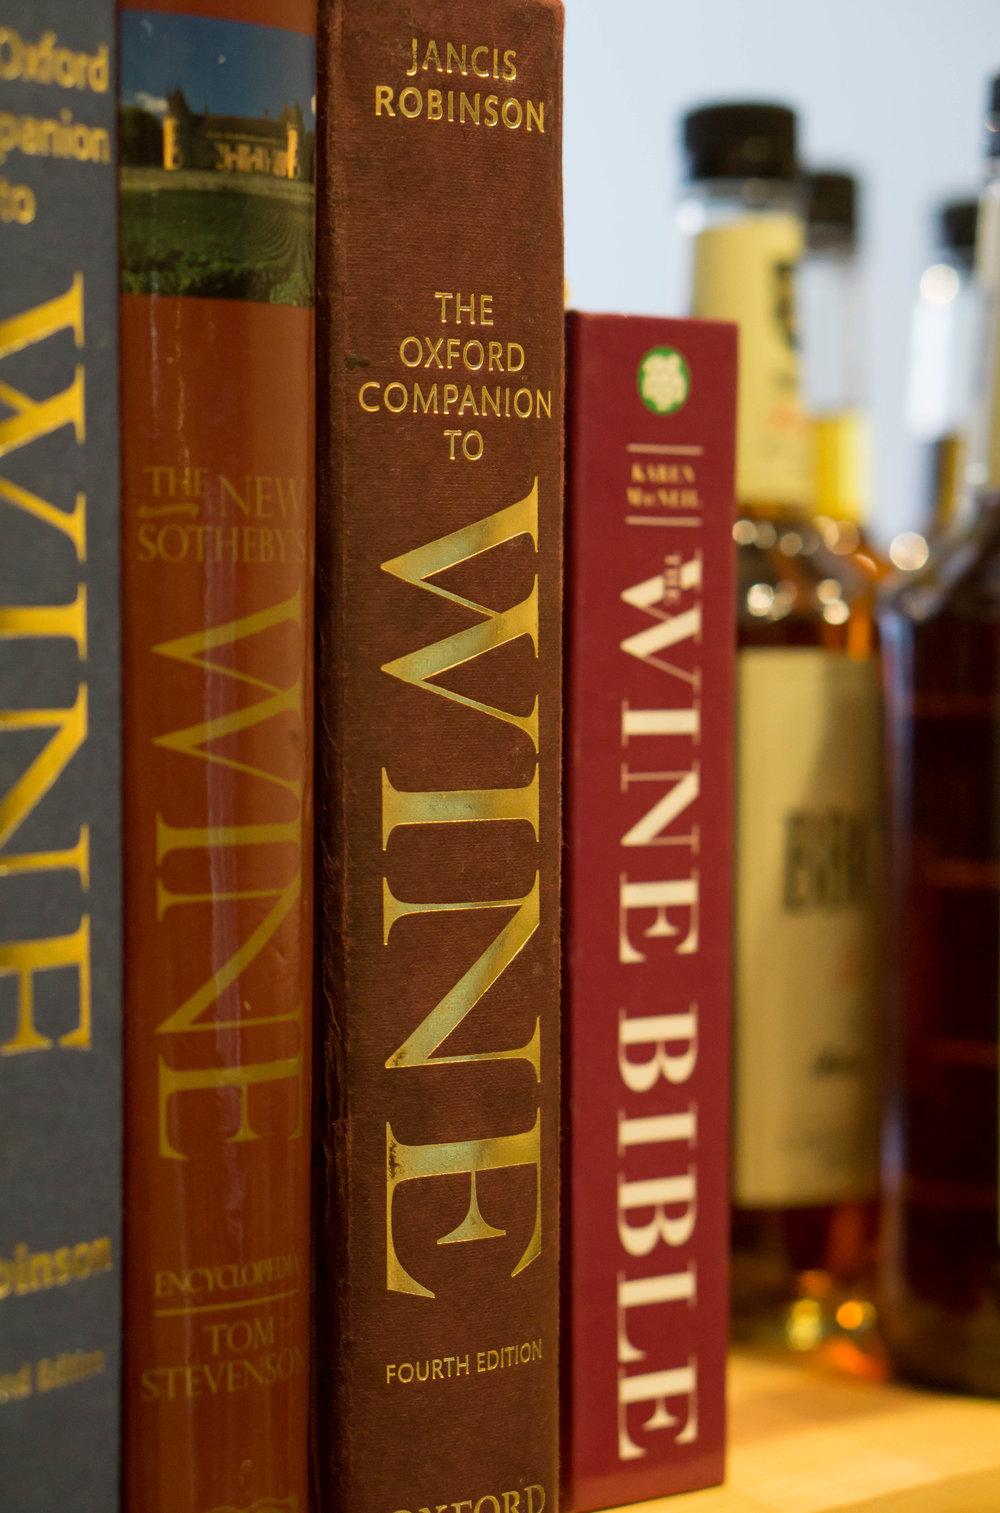 57th Street Wines-15.jpg